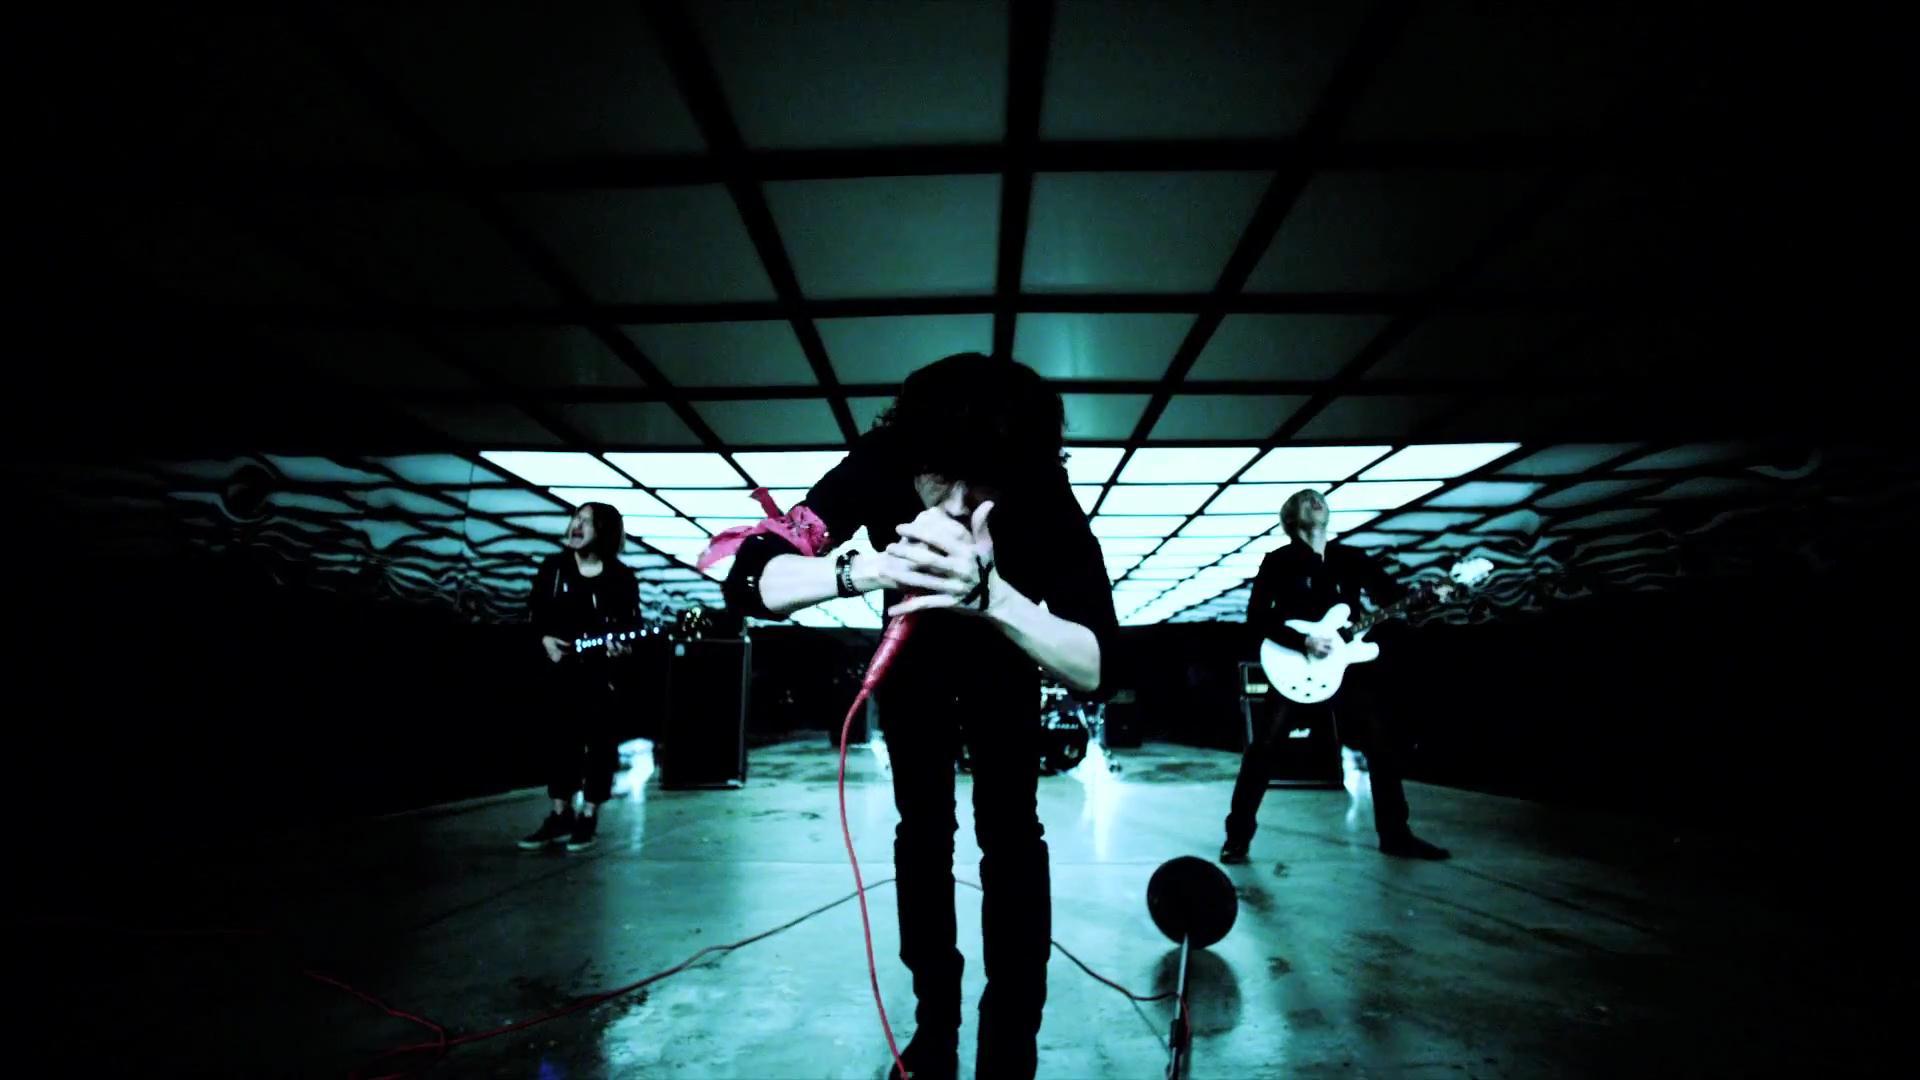 壁紙 One Ok Rock Live 画像